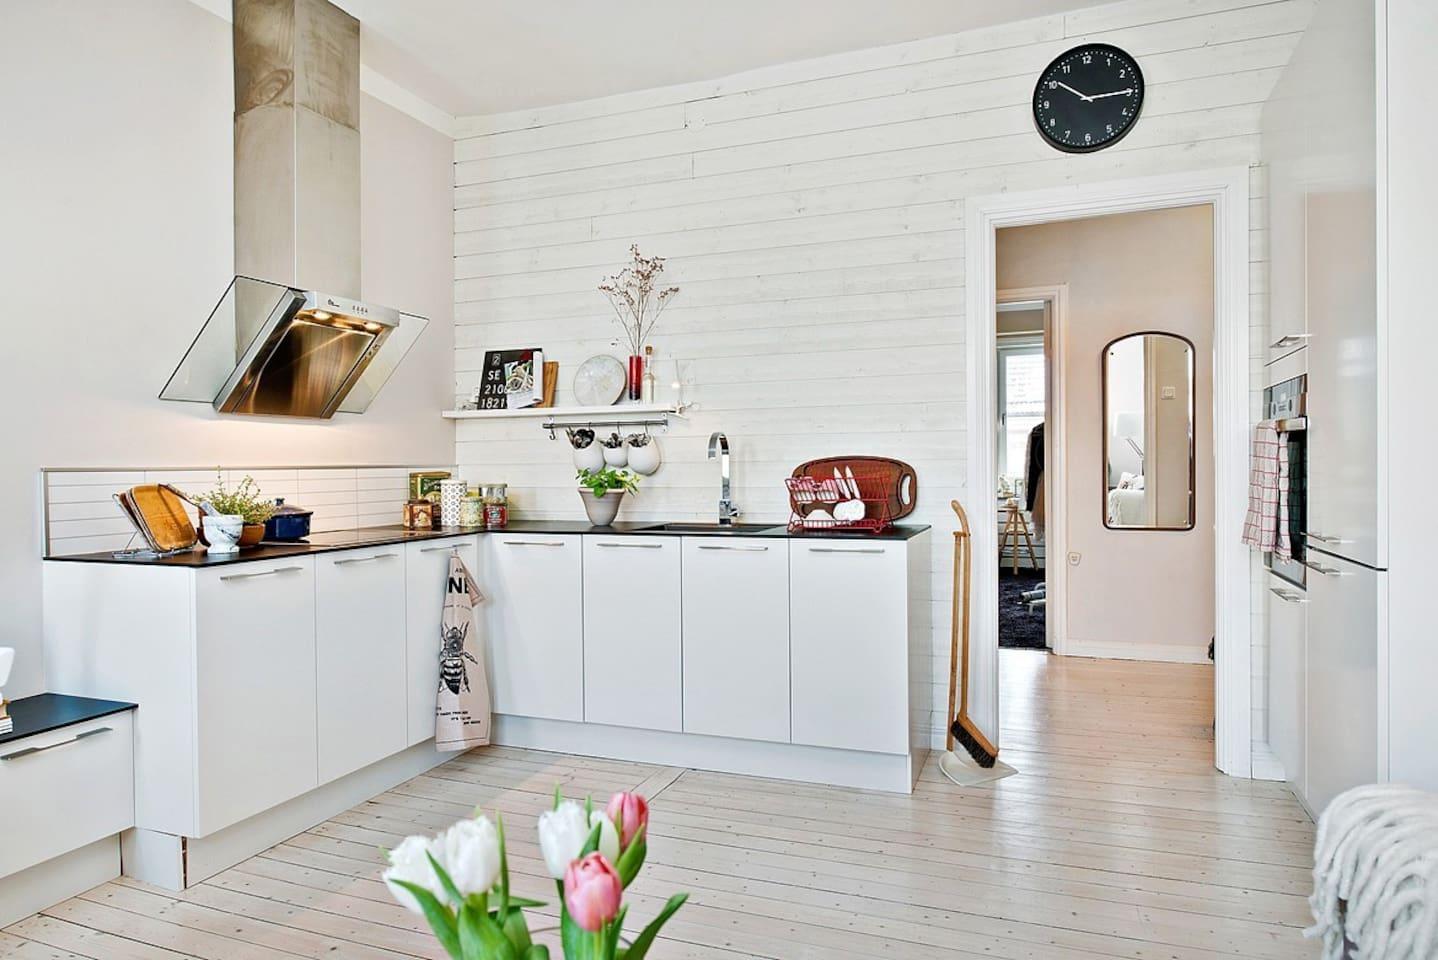 gothenburg memorable airbnb